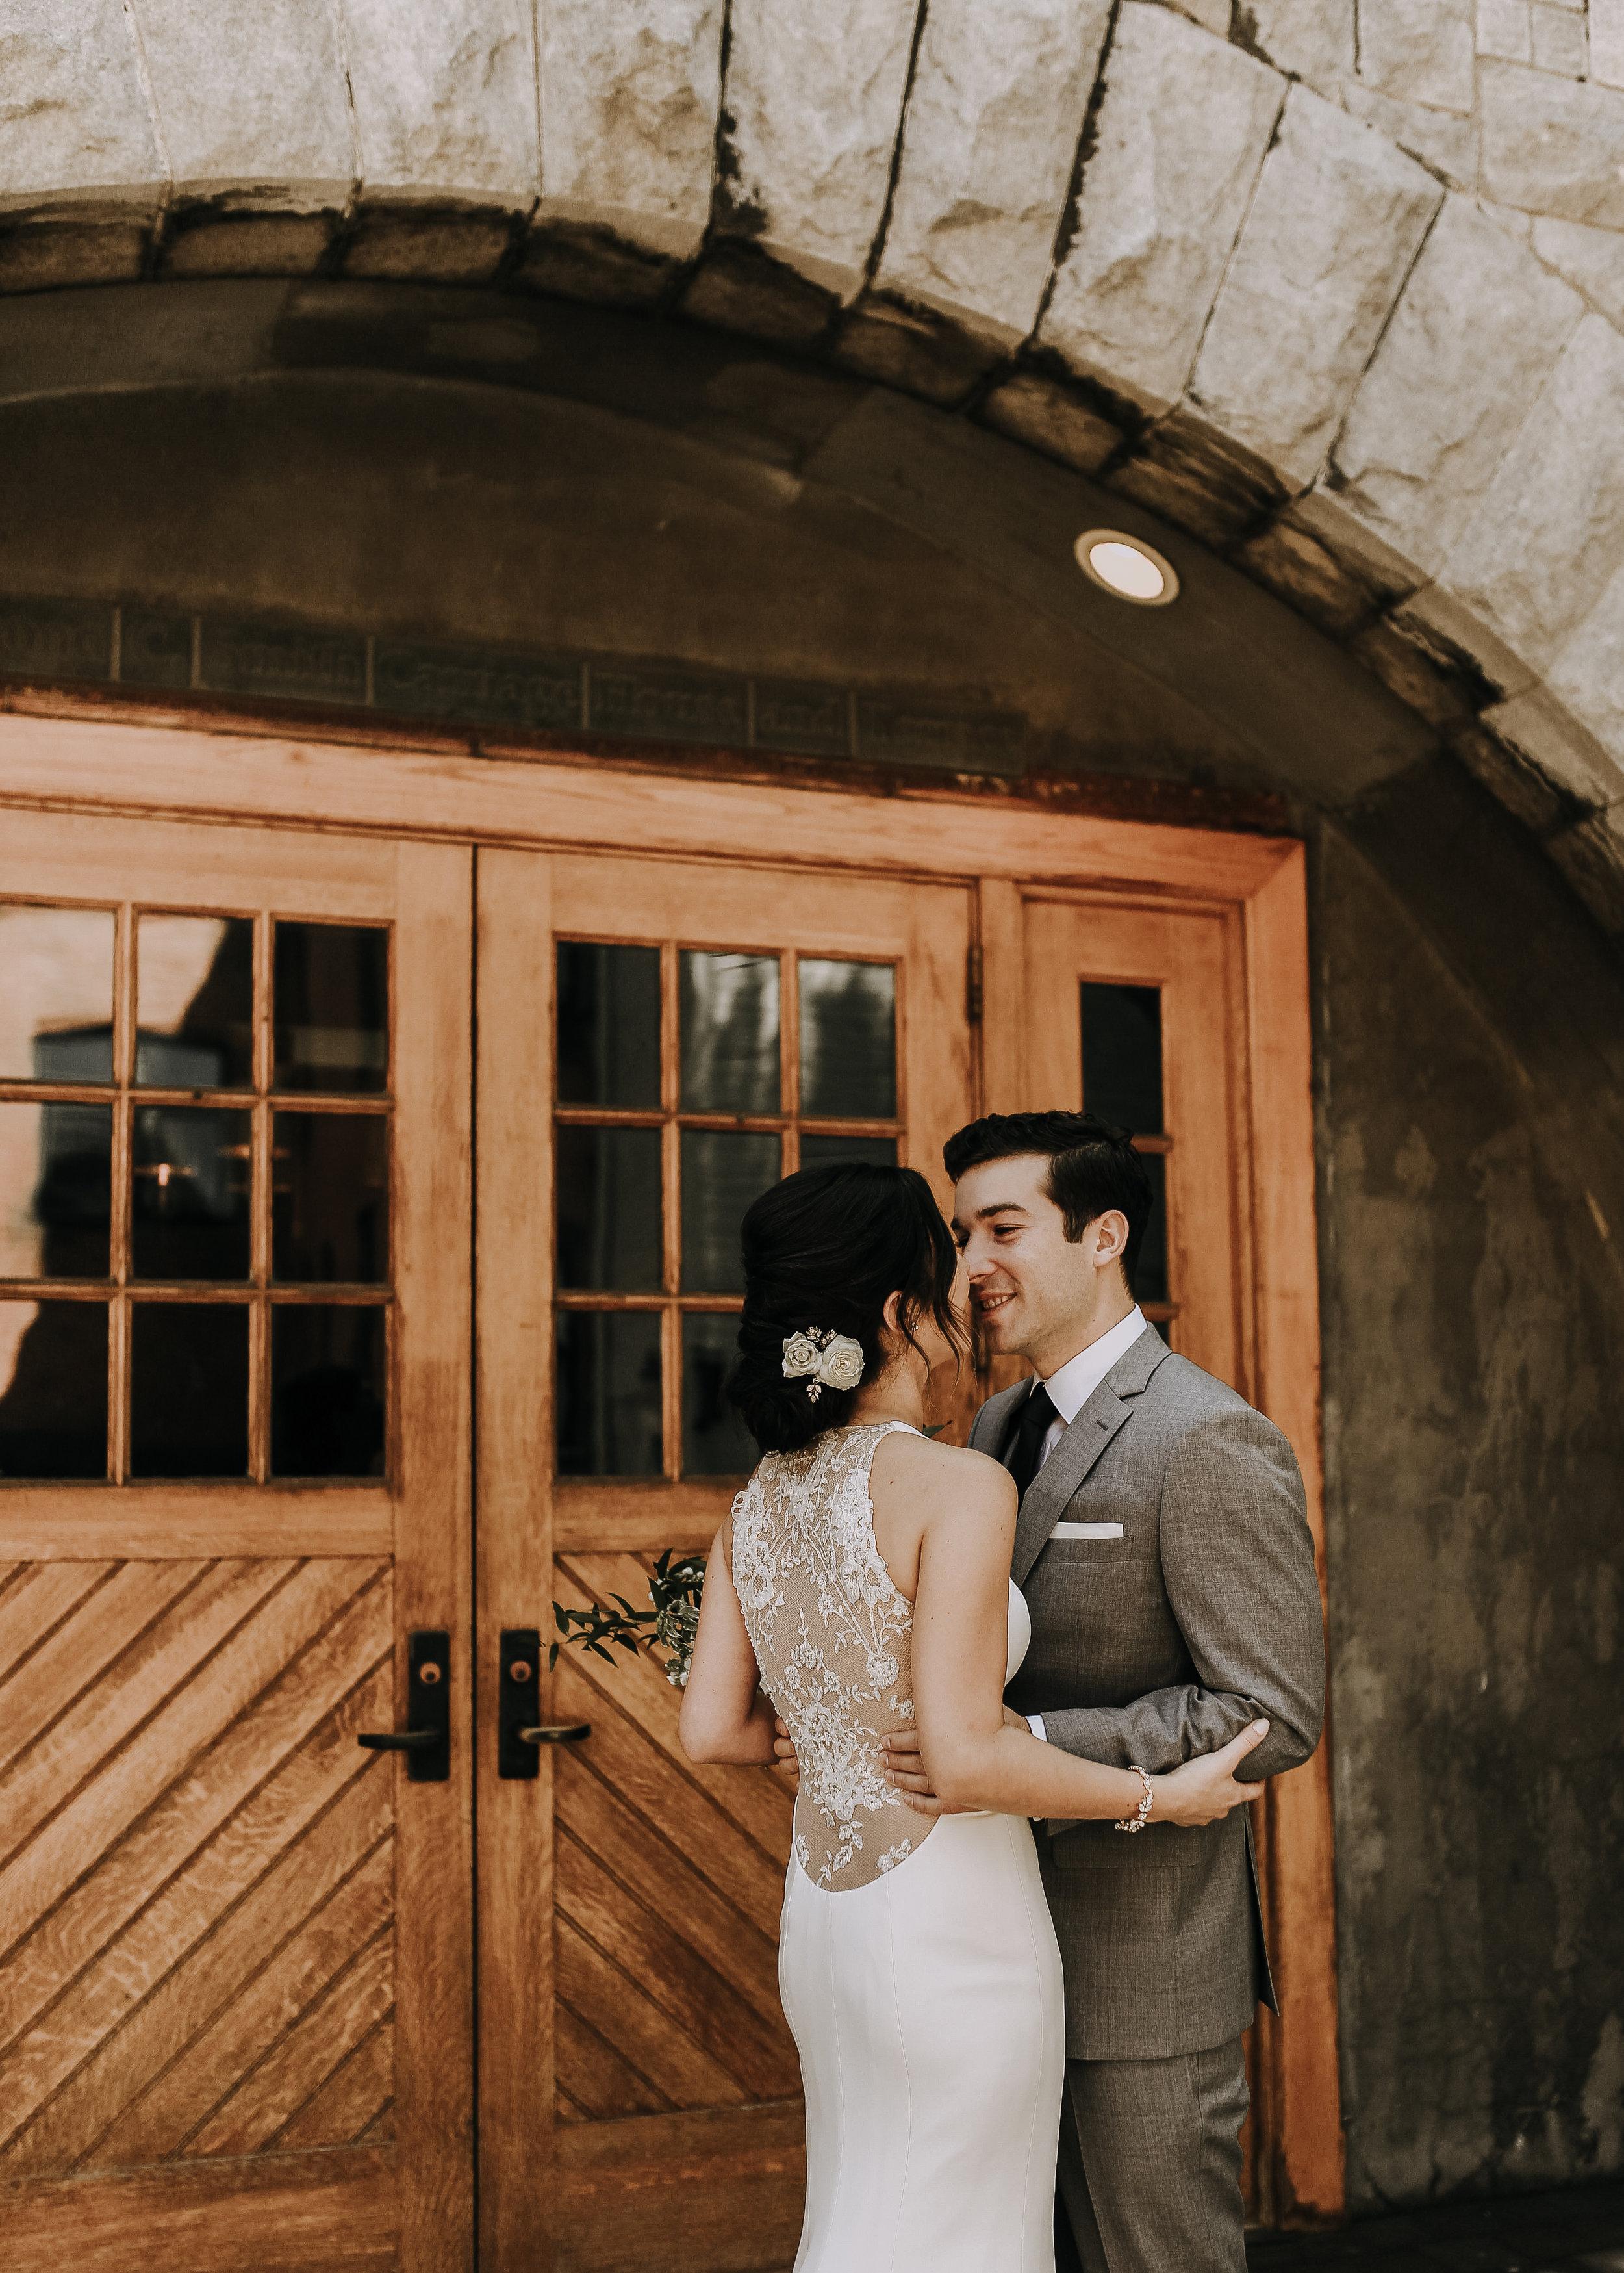 Rachel+Timothy_Wedding_186.jpg